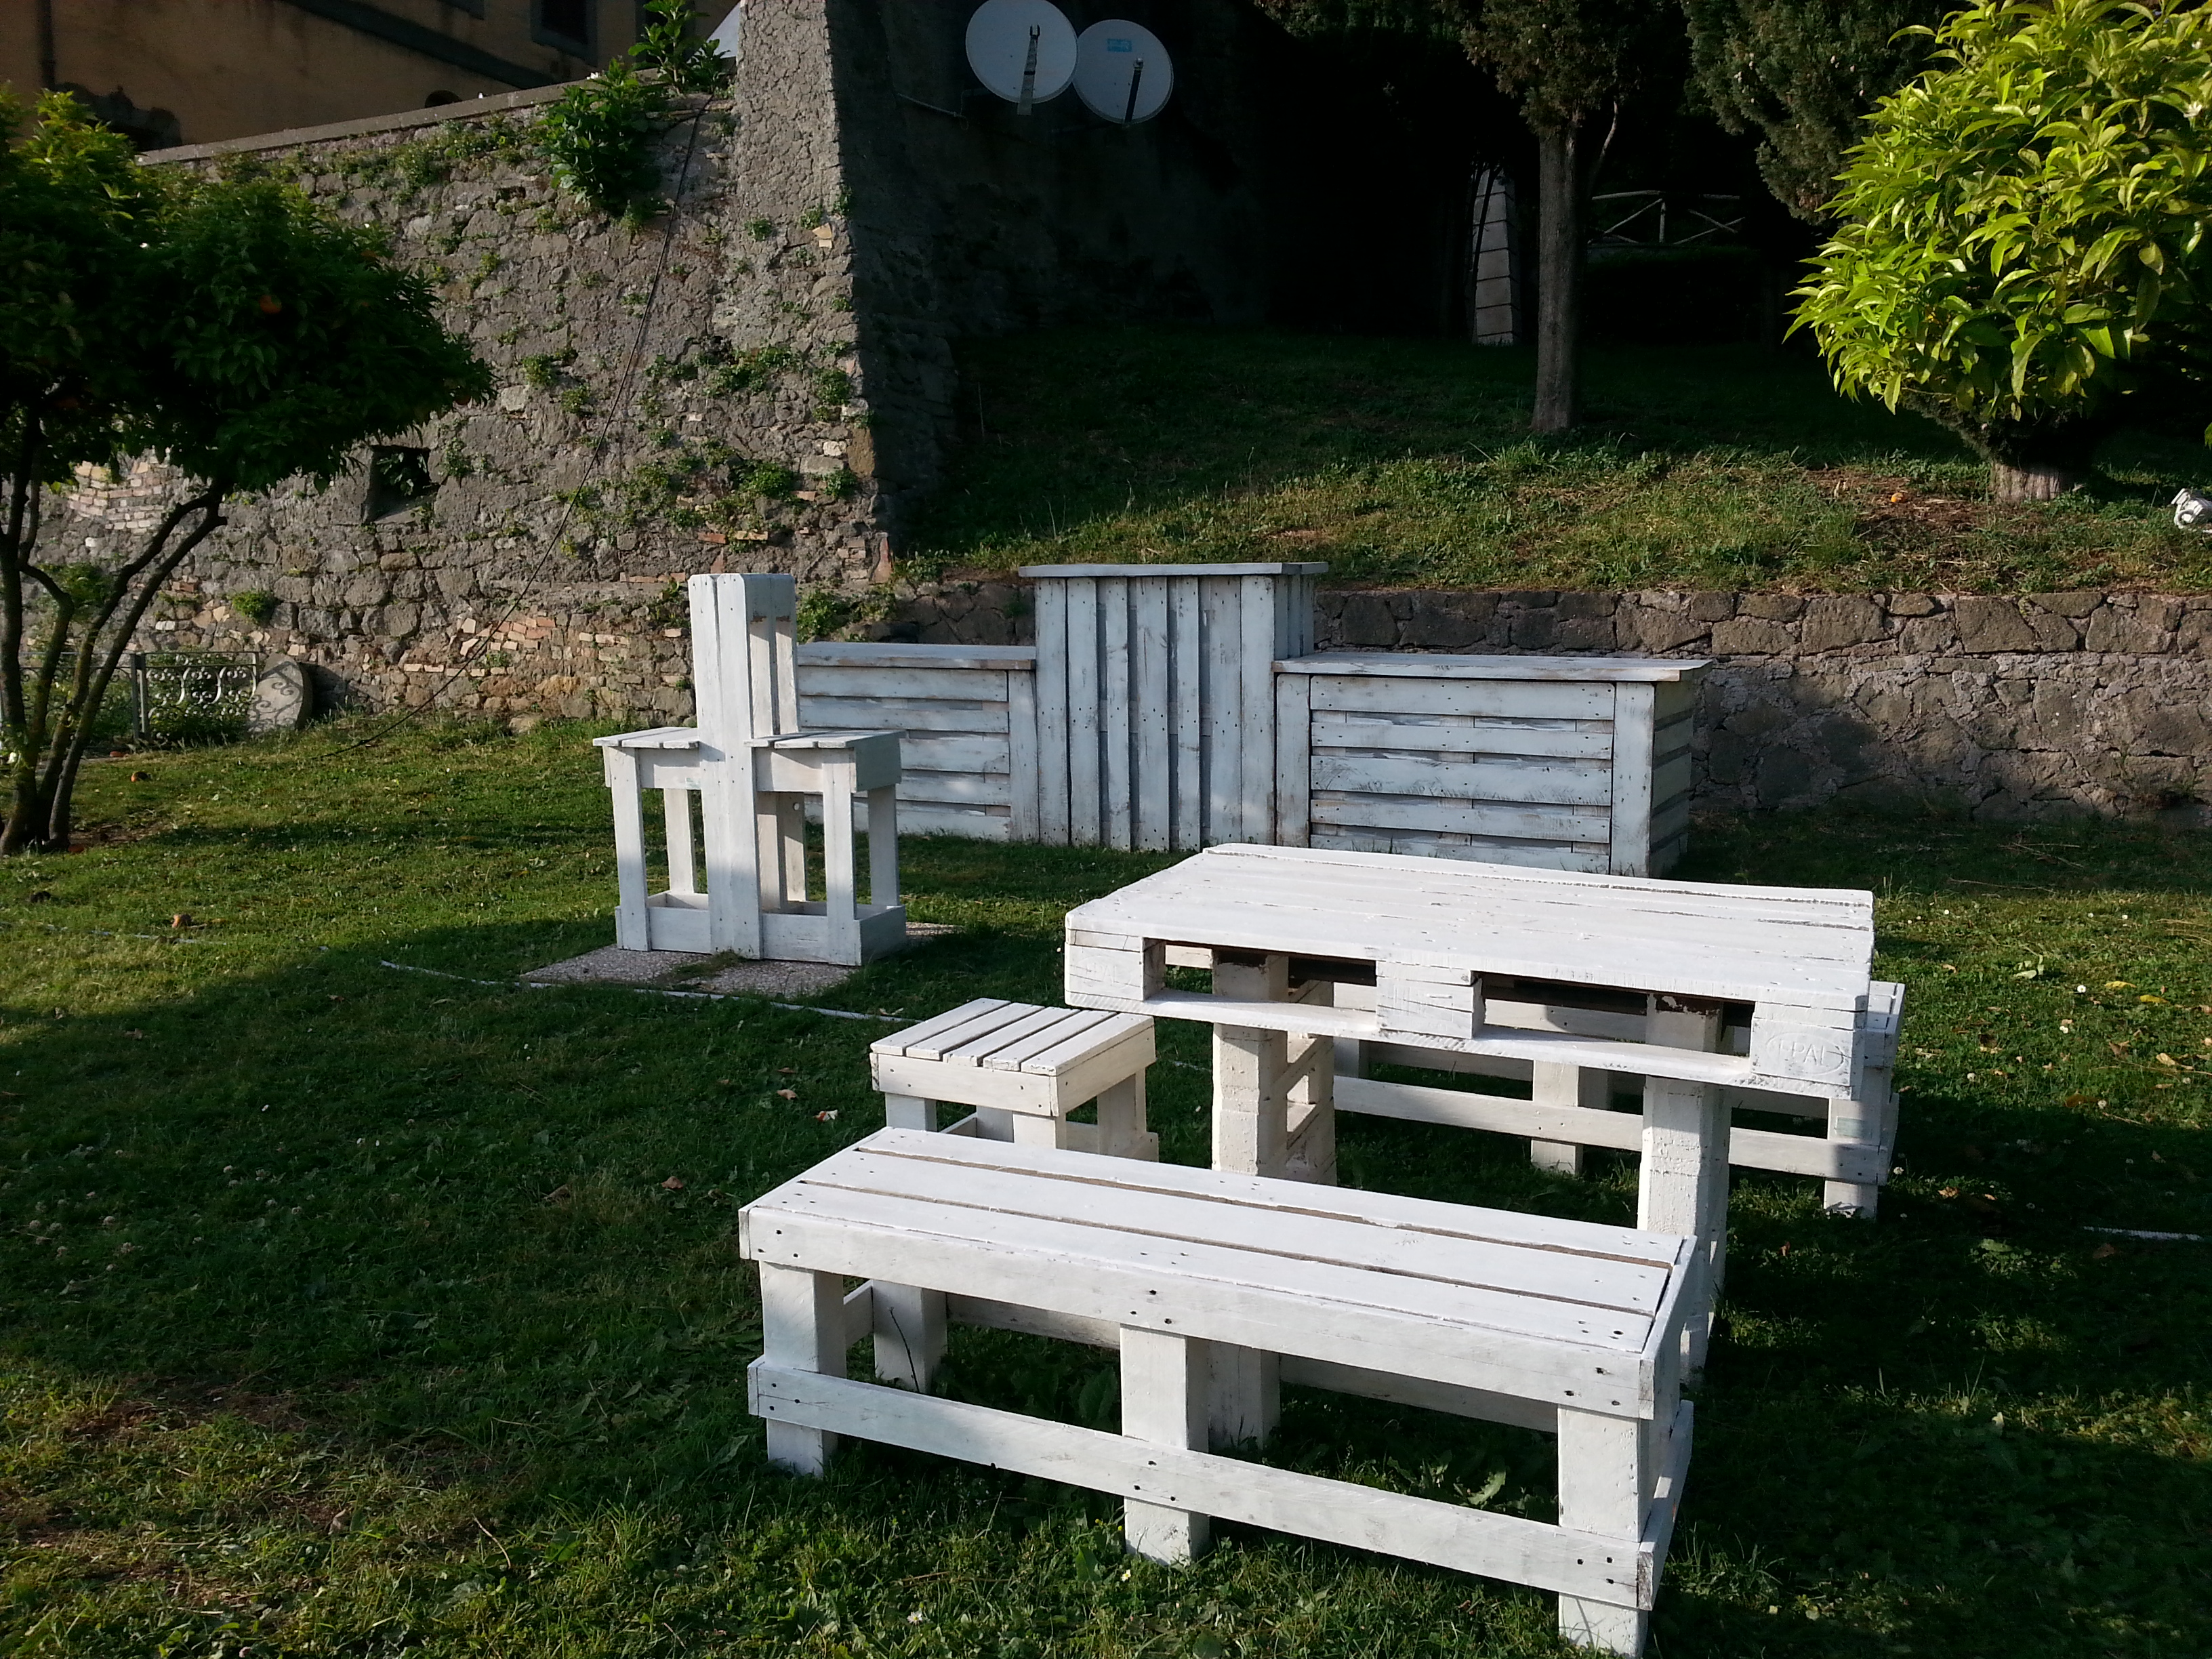 Arredo giardino in pallet archivi mobili in pallet for Arredamento da giardino